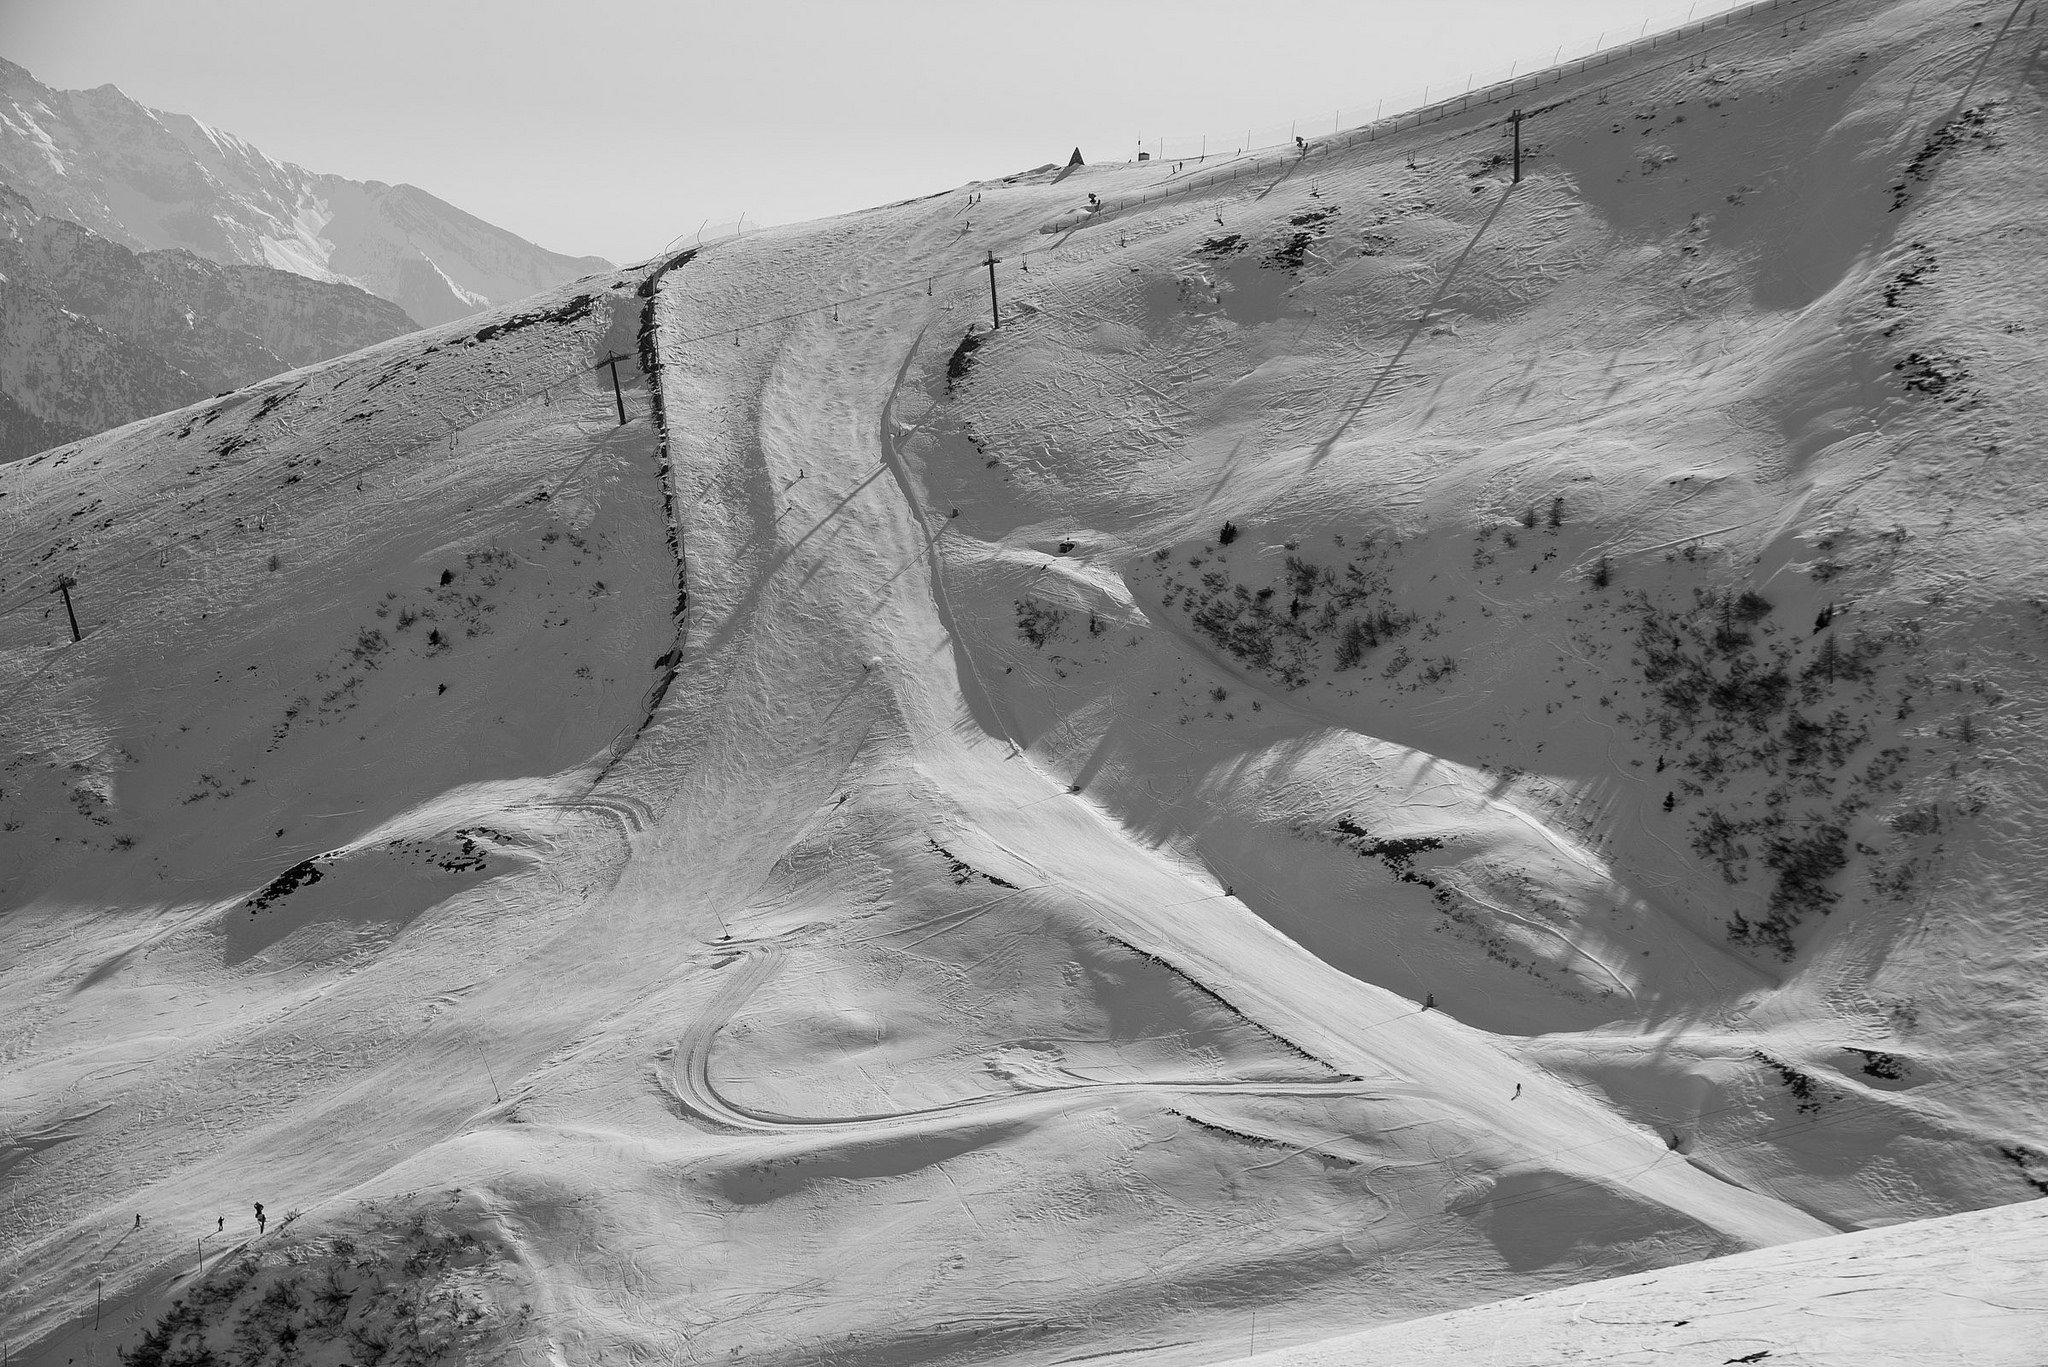 The Perfect European Budget Ski Resort